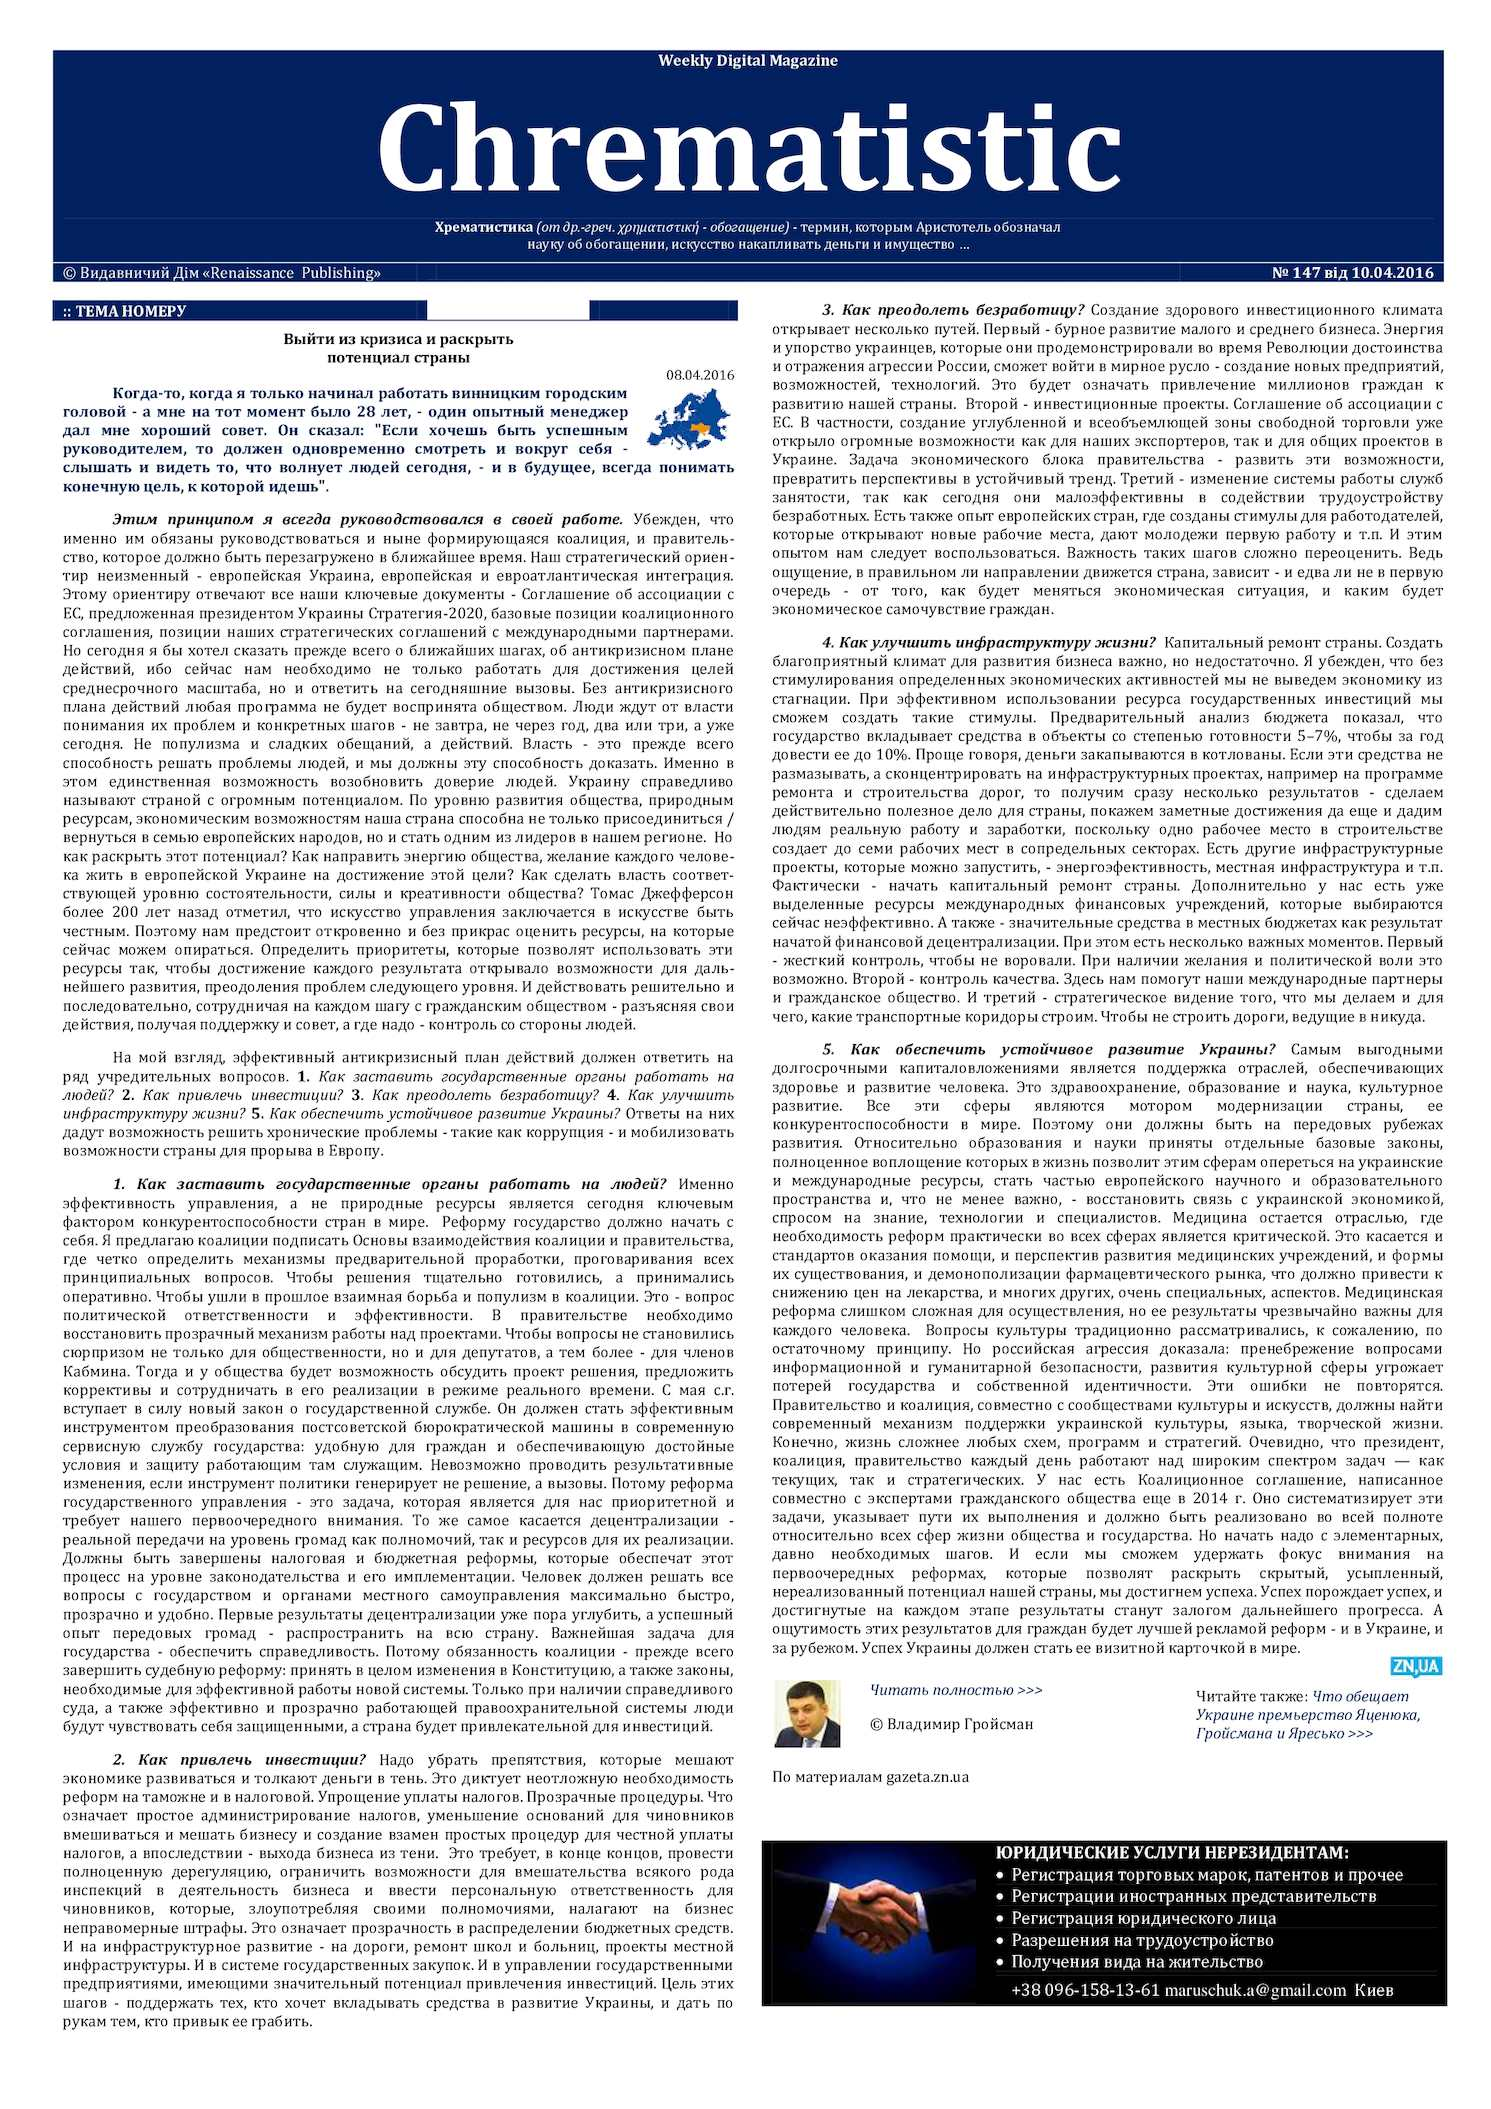 Calaméo - №147 Wdm «Chrematistic» от 10 04 2016 4cea9e92ae81a